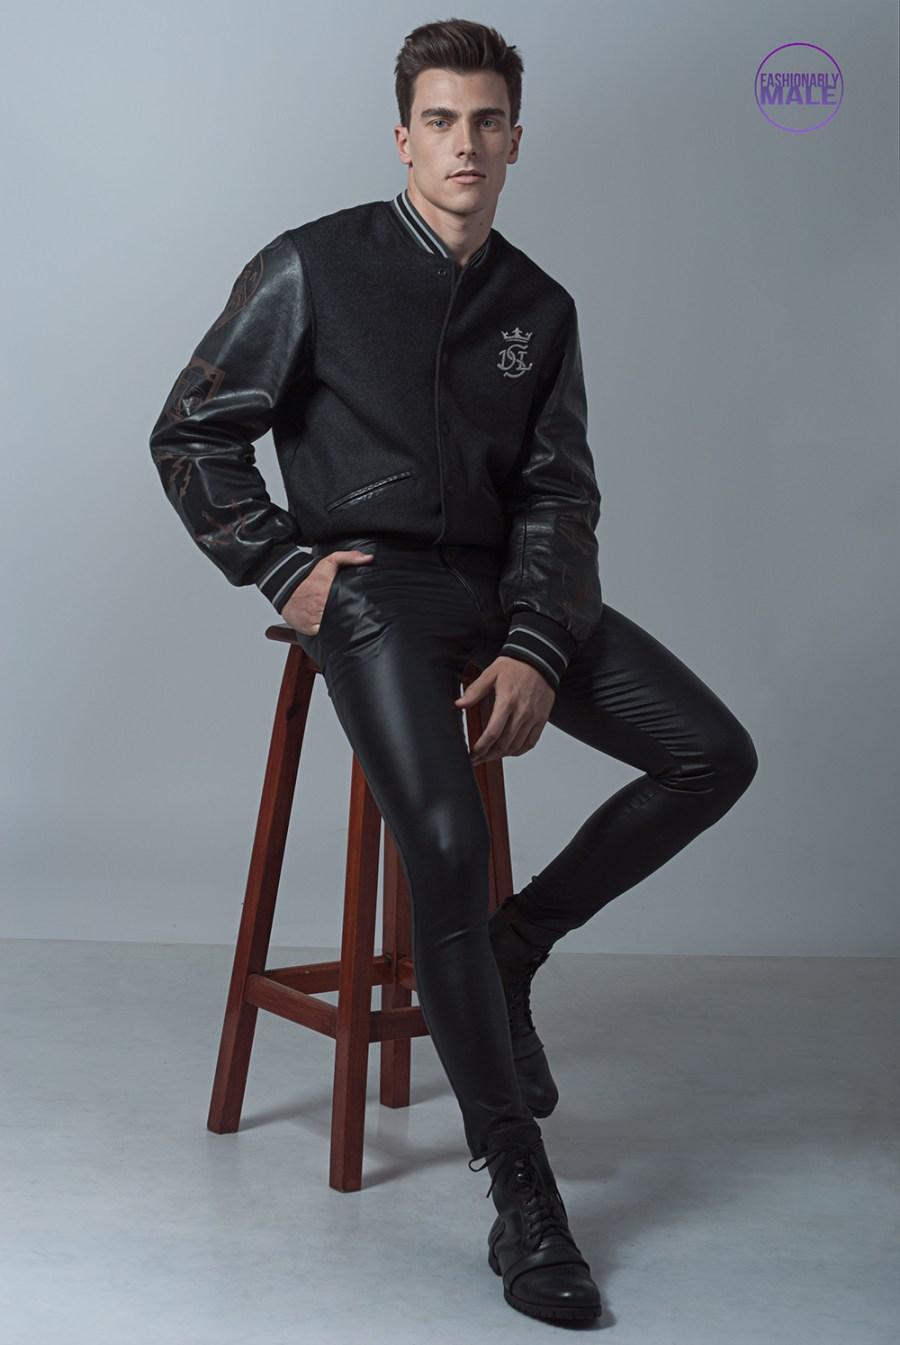 Tomas by Jo Herrera for Fashionably Male11